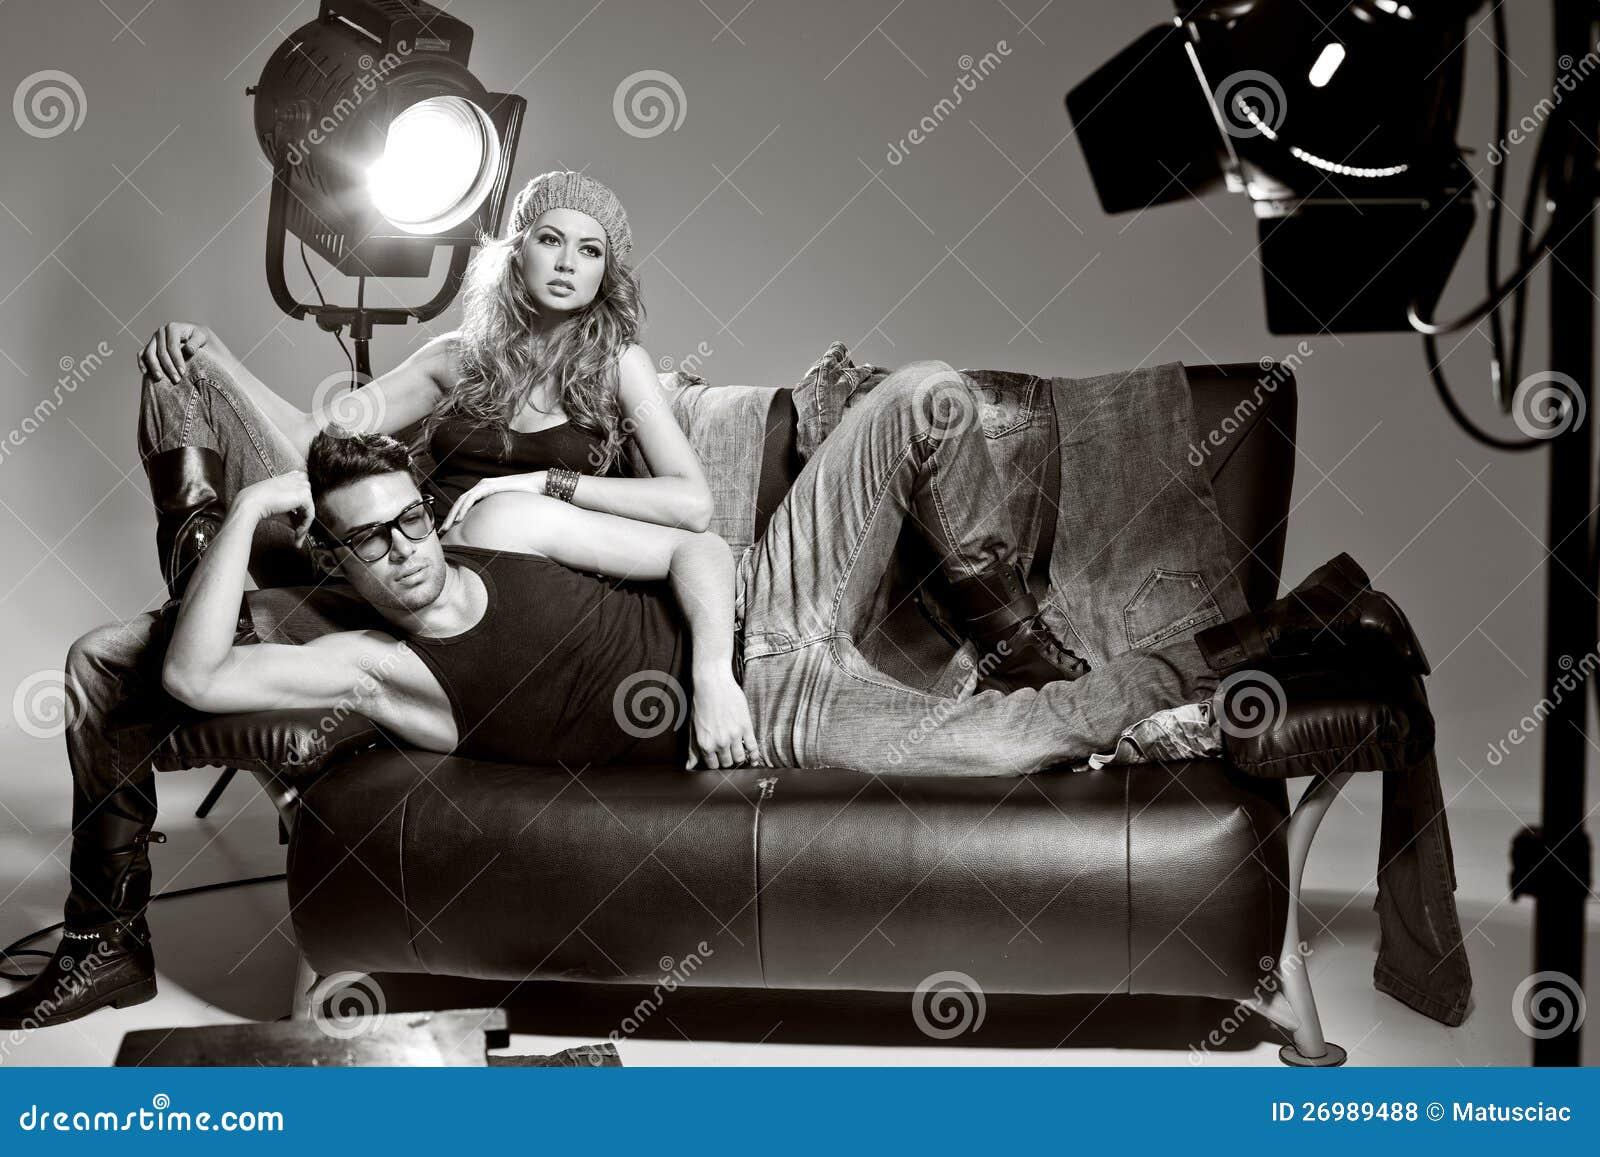 Free Stock Photos  Sexy Man And Woman Doing A Fashion Photo Shoot